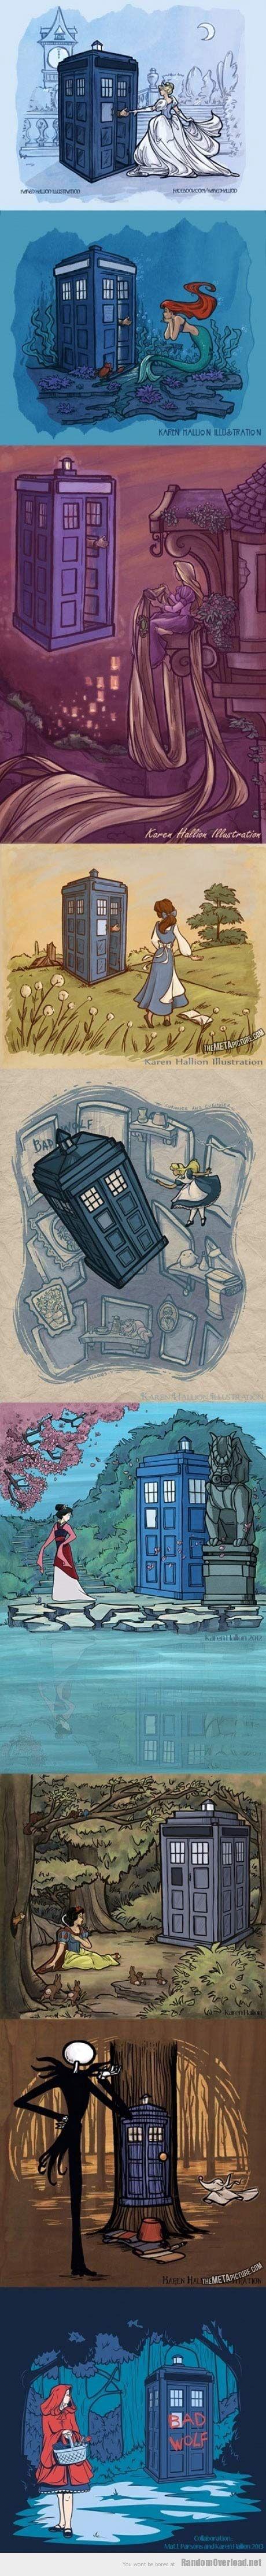 disney princesses and the TARDIS, aww yeeeaaahhh